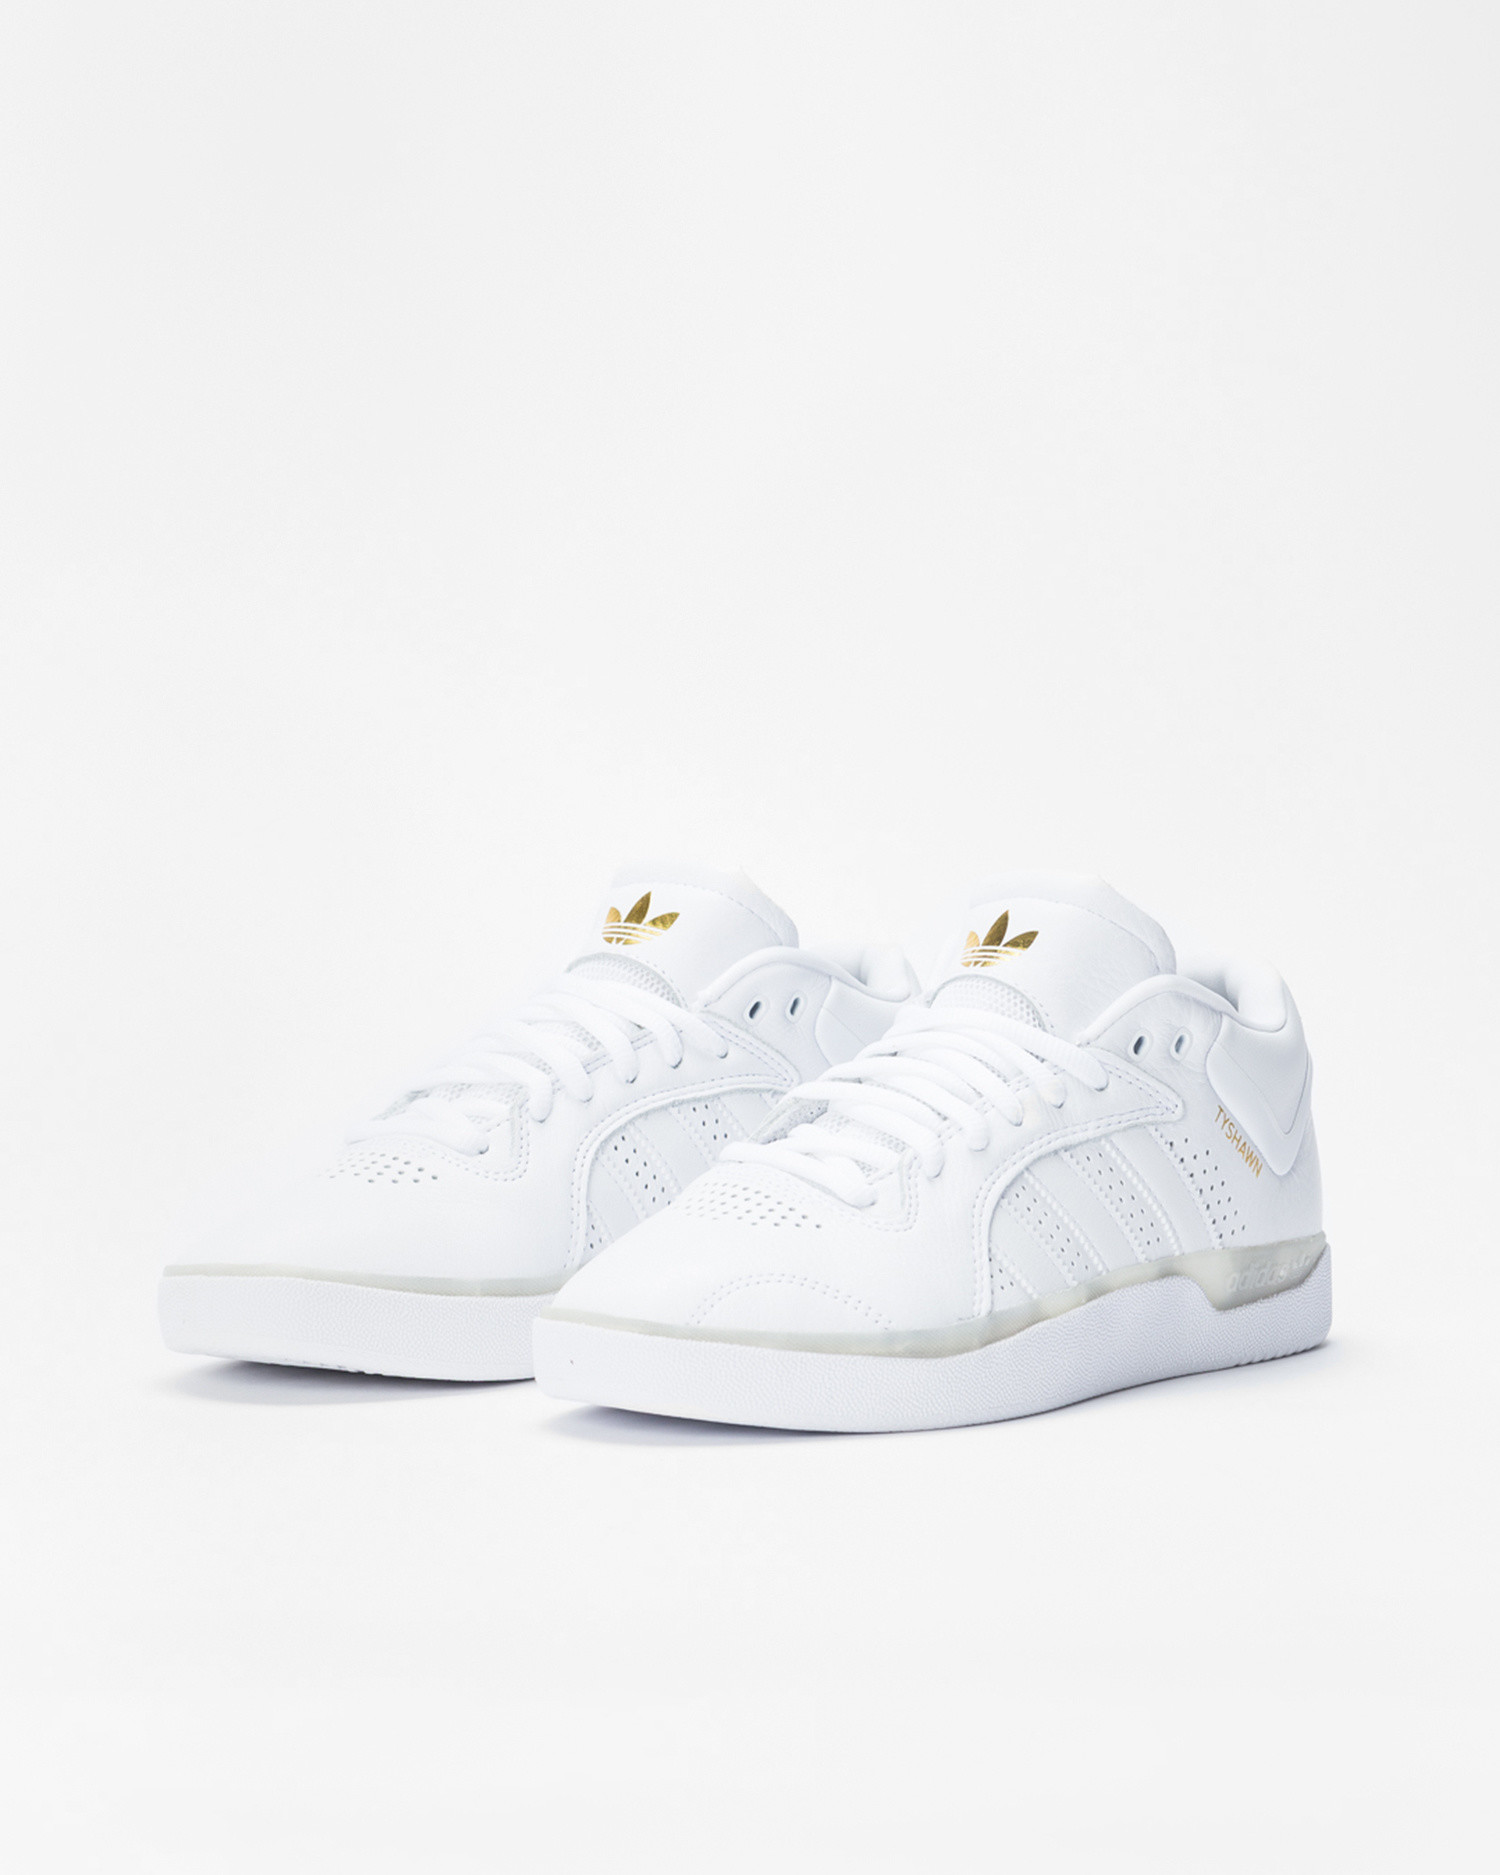 Adidas Tyshawn Footwear White/Footwear White/Footwear White